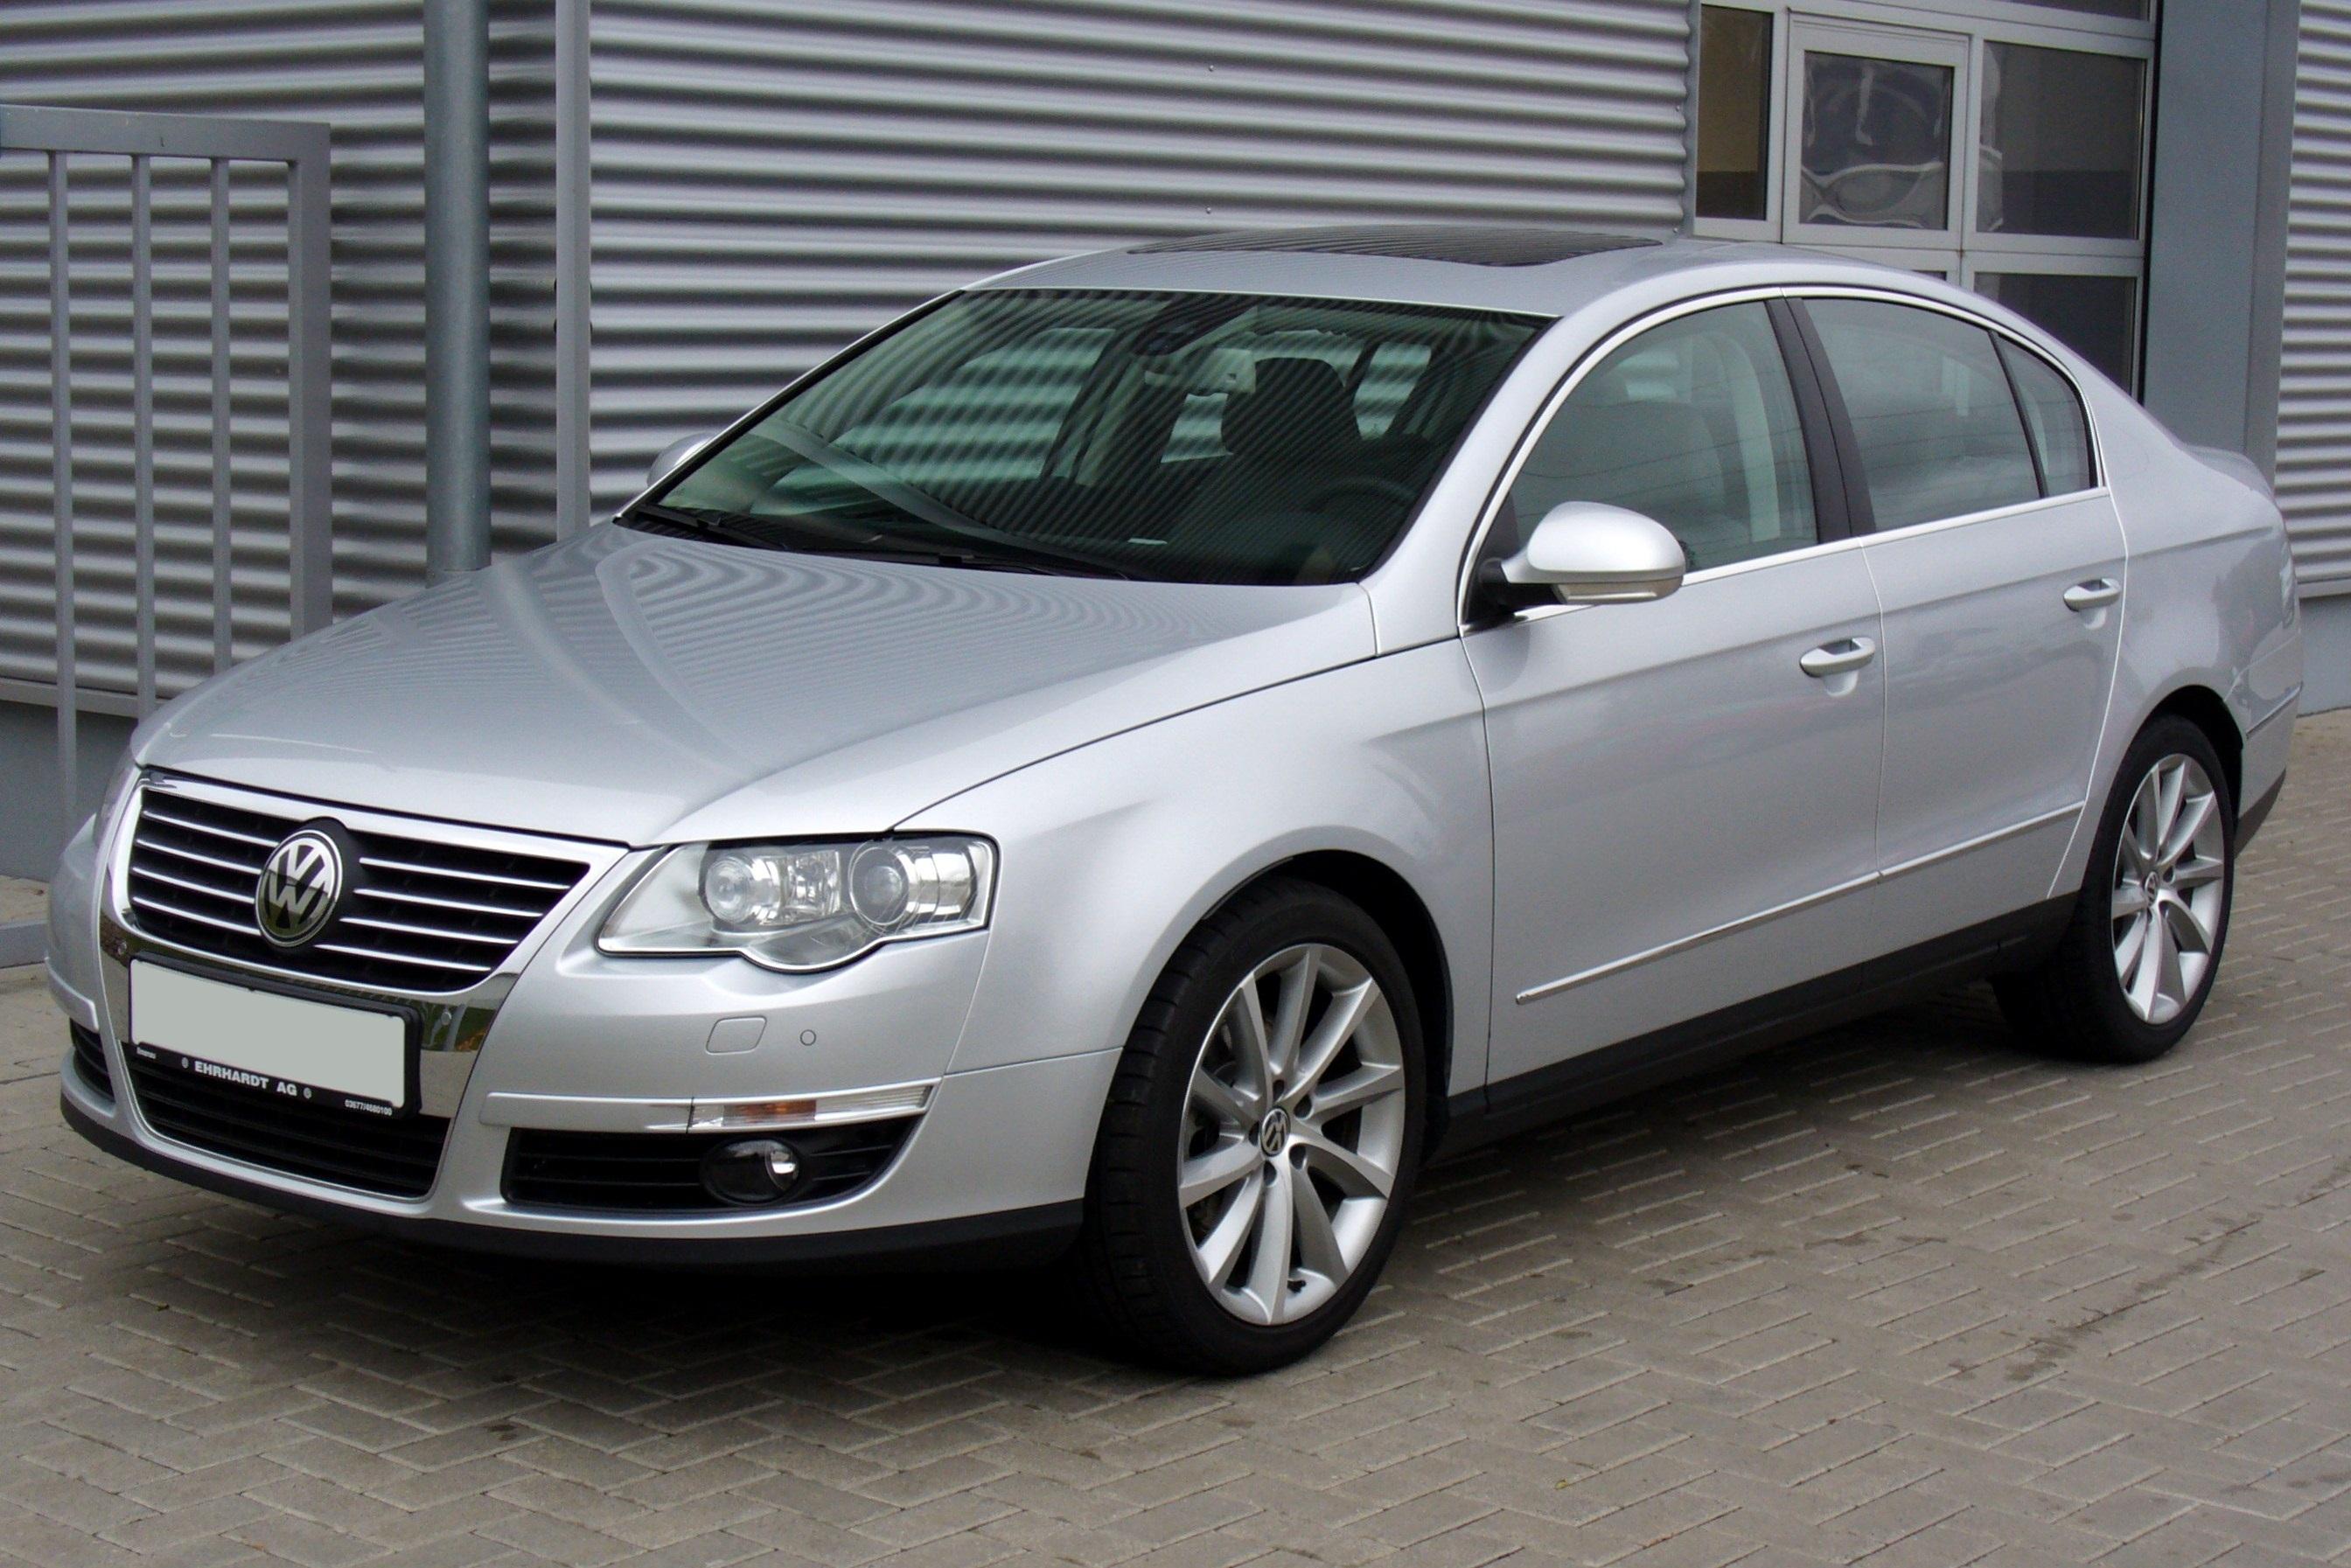 VW_Passat_B6_Limousine_2.0_TDI_DSG_Highline_Reflexsilber